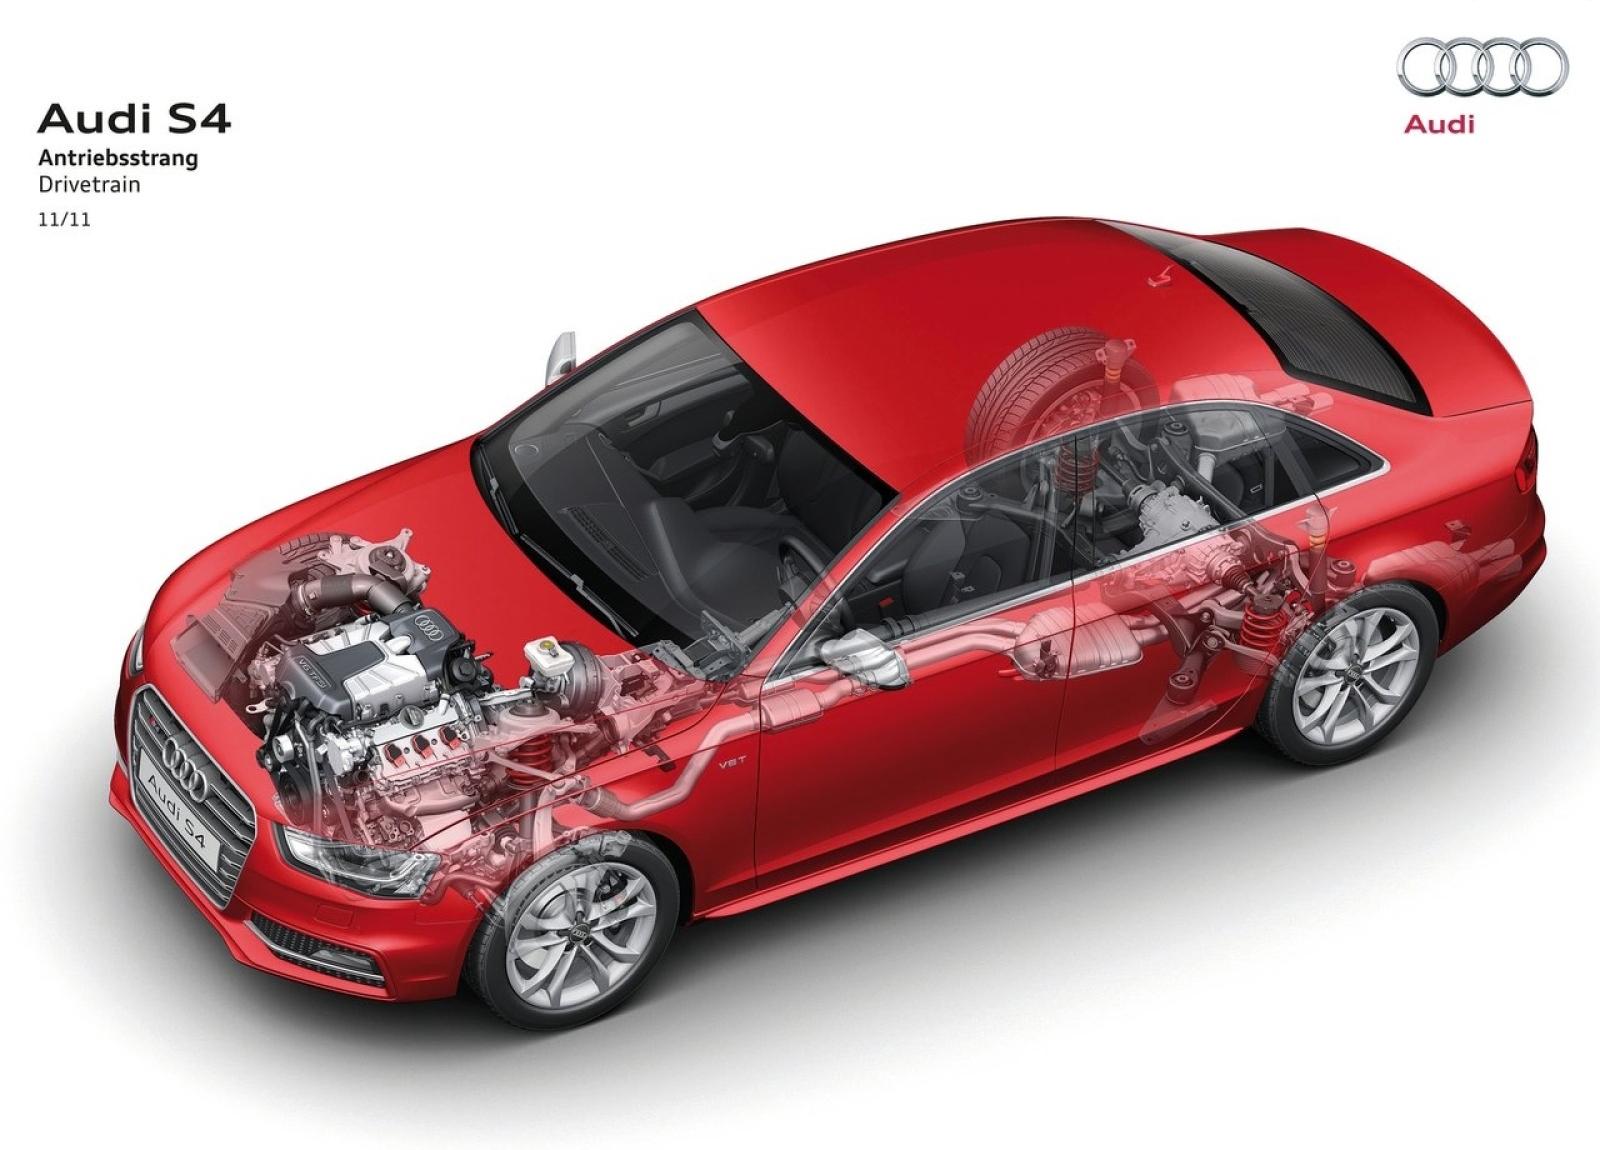 http://1.bp.blogspot.com/-JFK-wA_5XFM/TzZ7g9OZszI/AAAAAAAAEgo/sp10kRkw5WE/s1600/Audi-2013_S4_wallpaper-1600x1200_0025.jpg